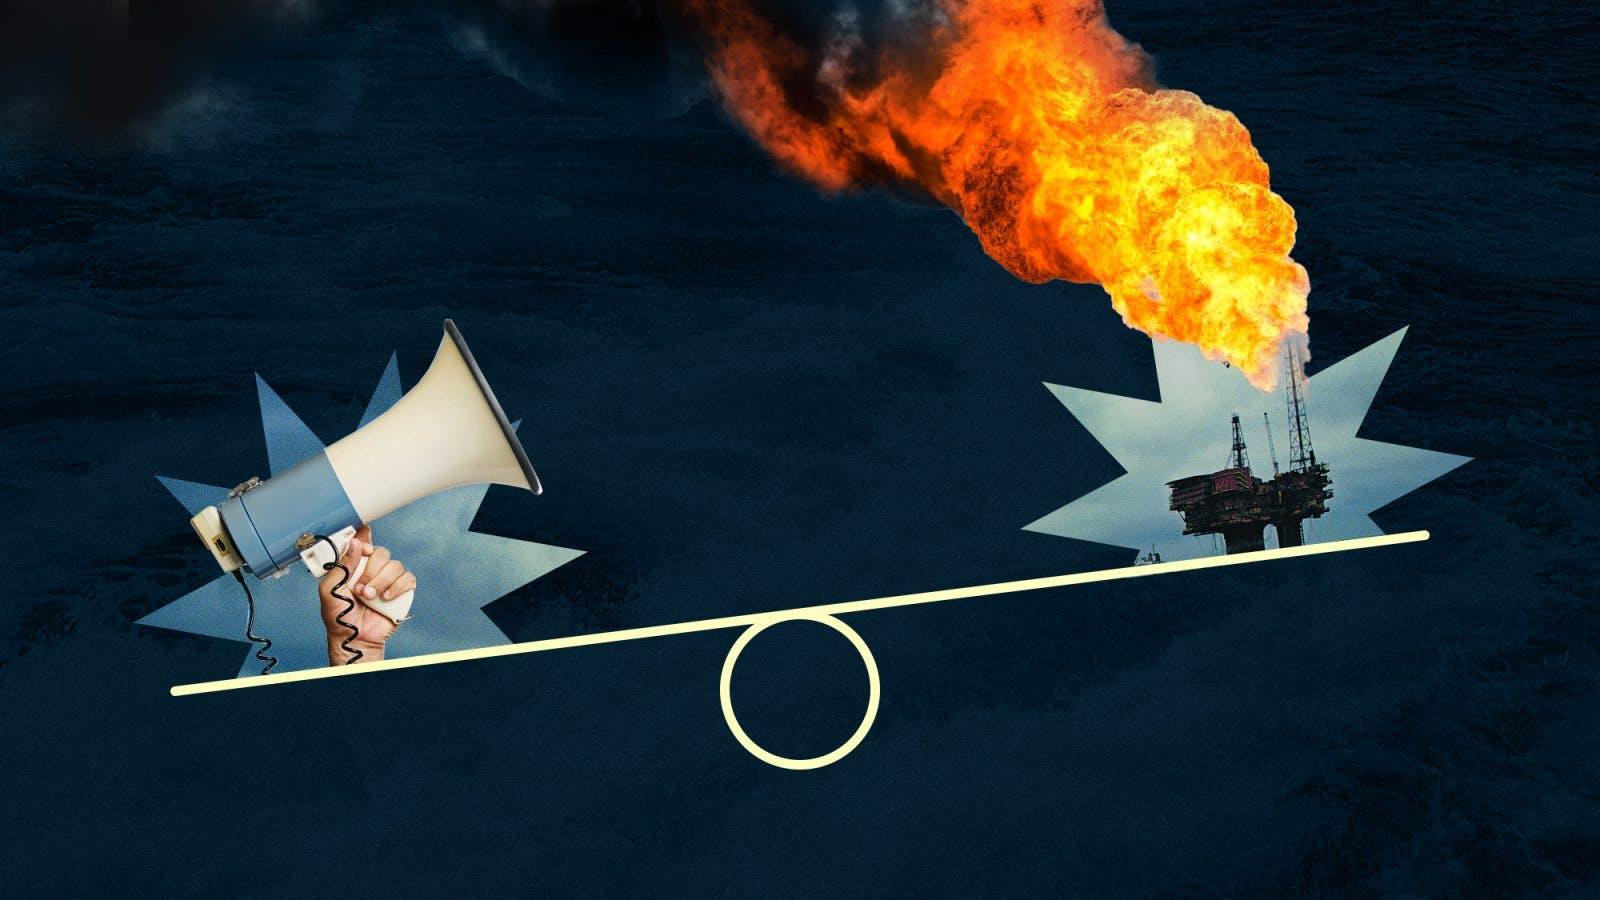 Megaphone yells at oil rig flaring